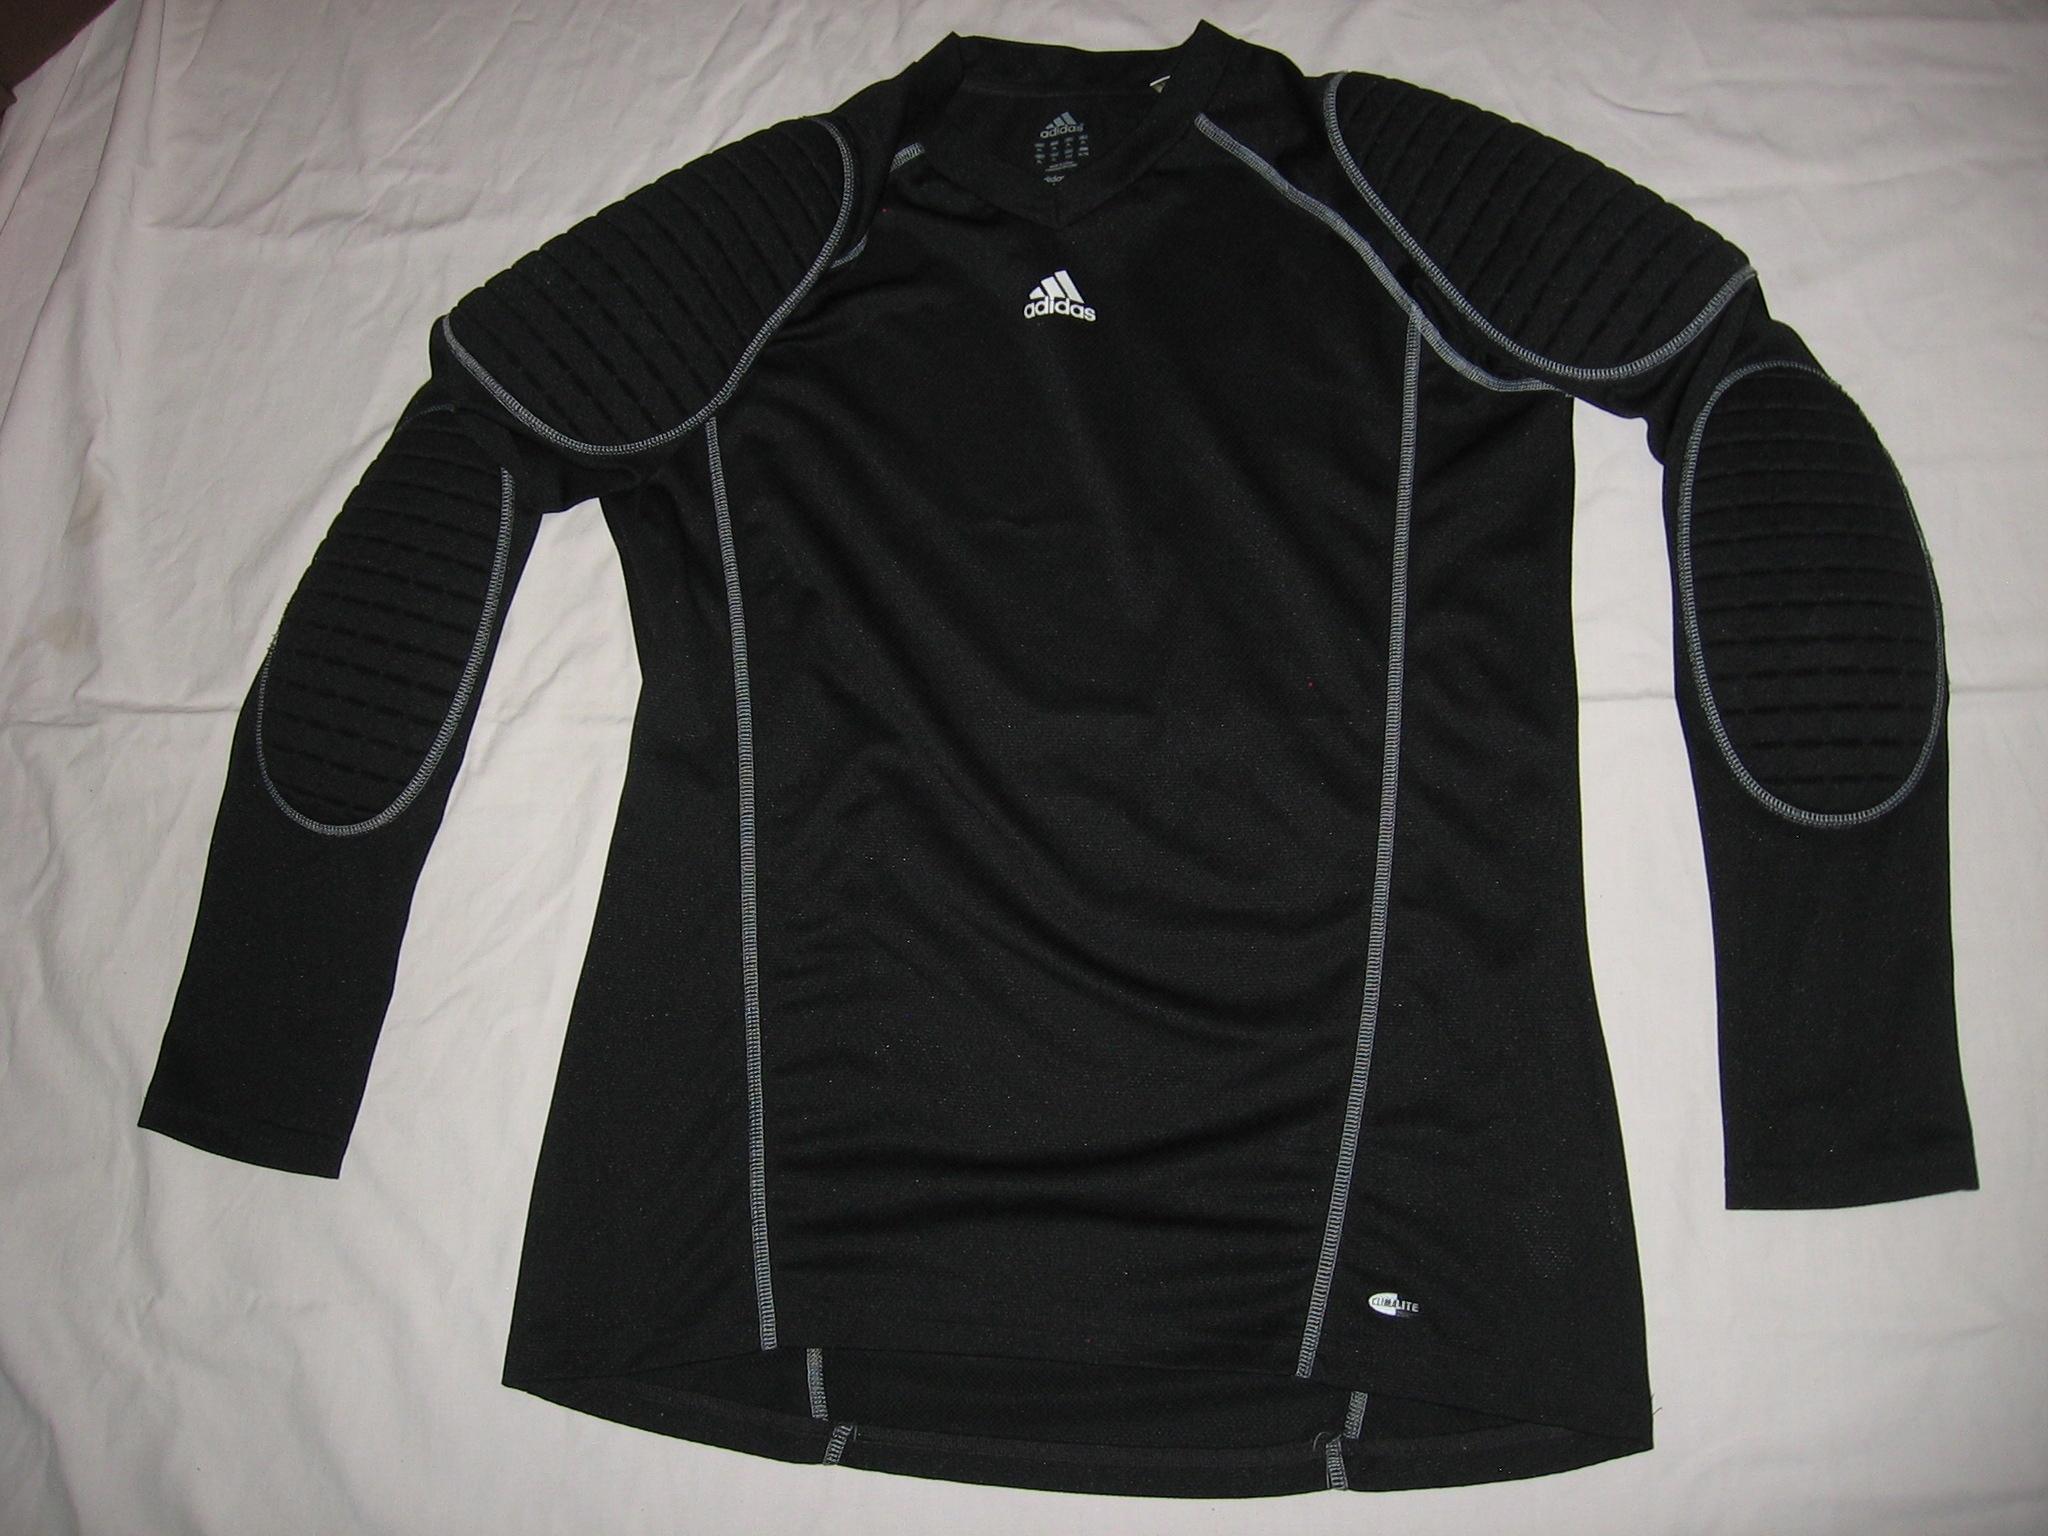 Bluza piłka nożna Adidas Clima365 ClimaLite XL